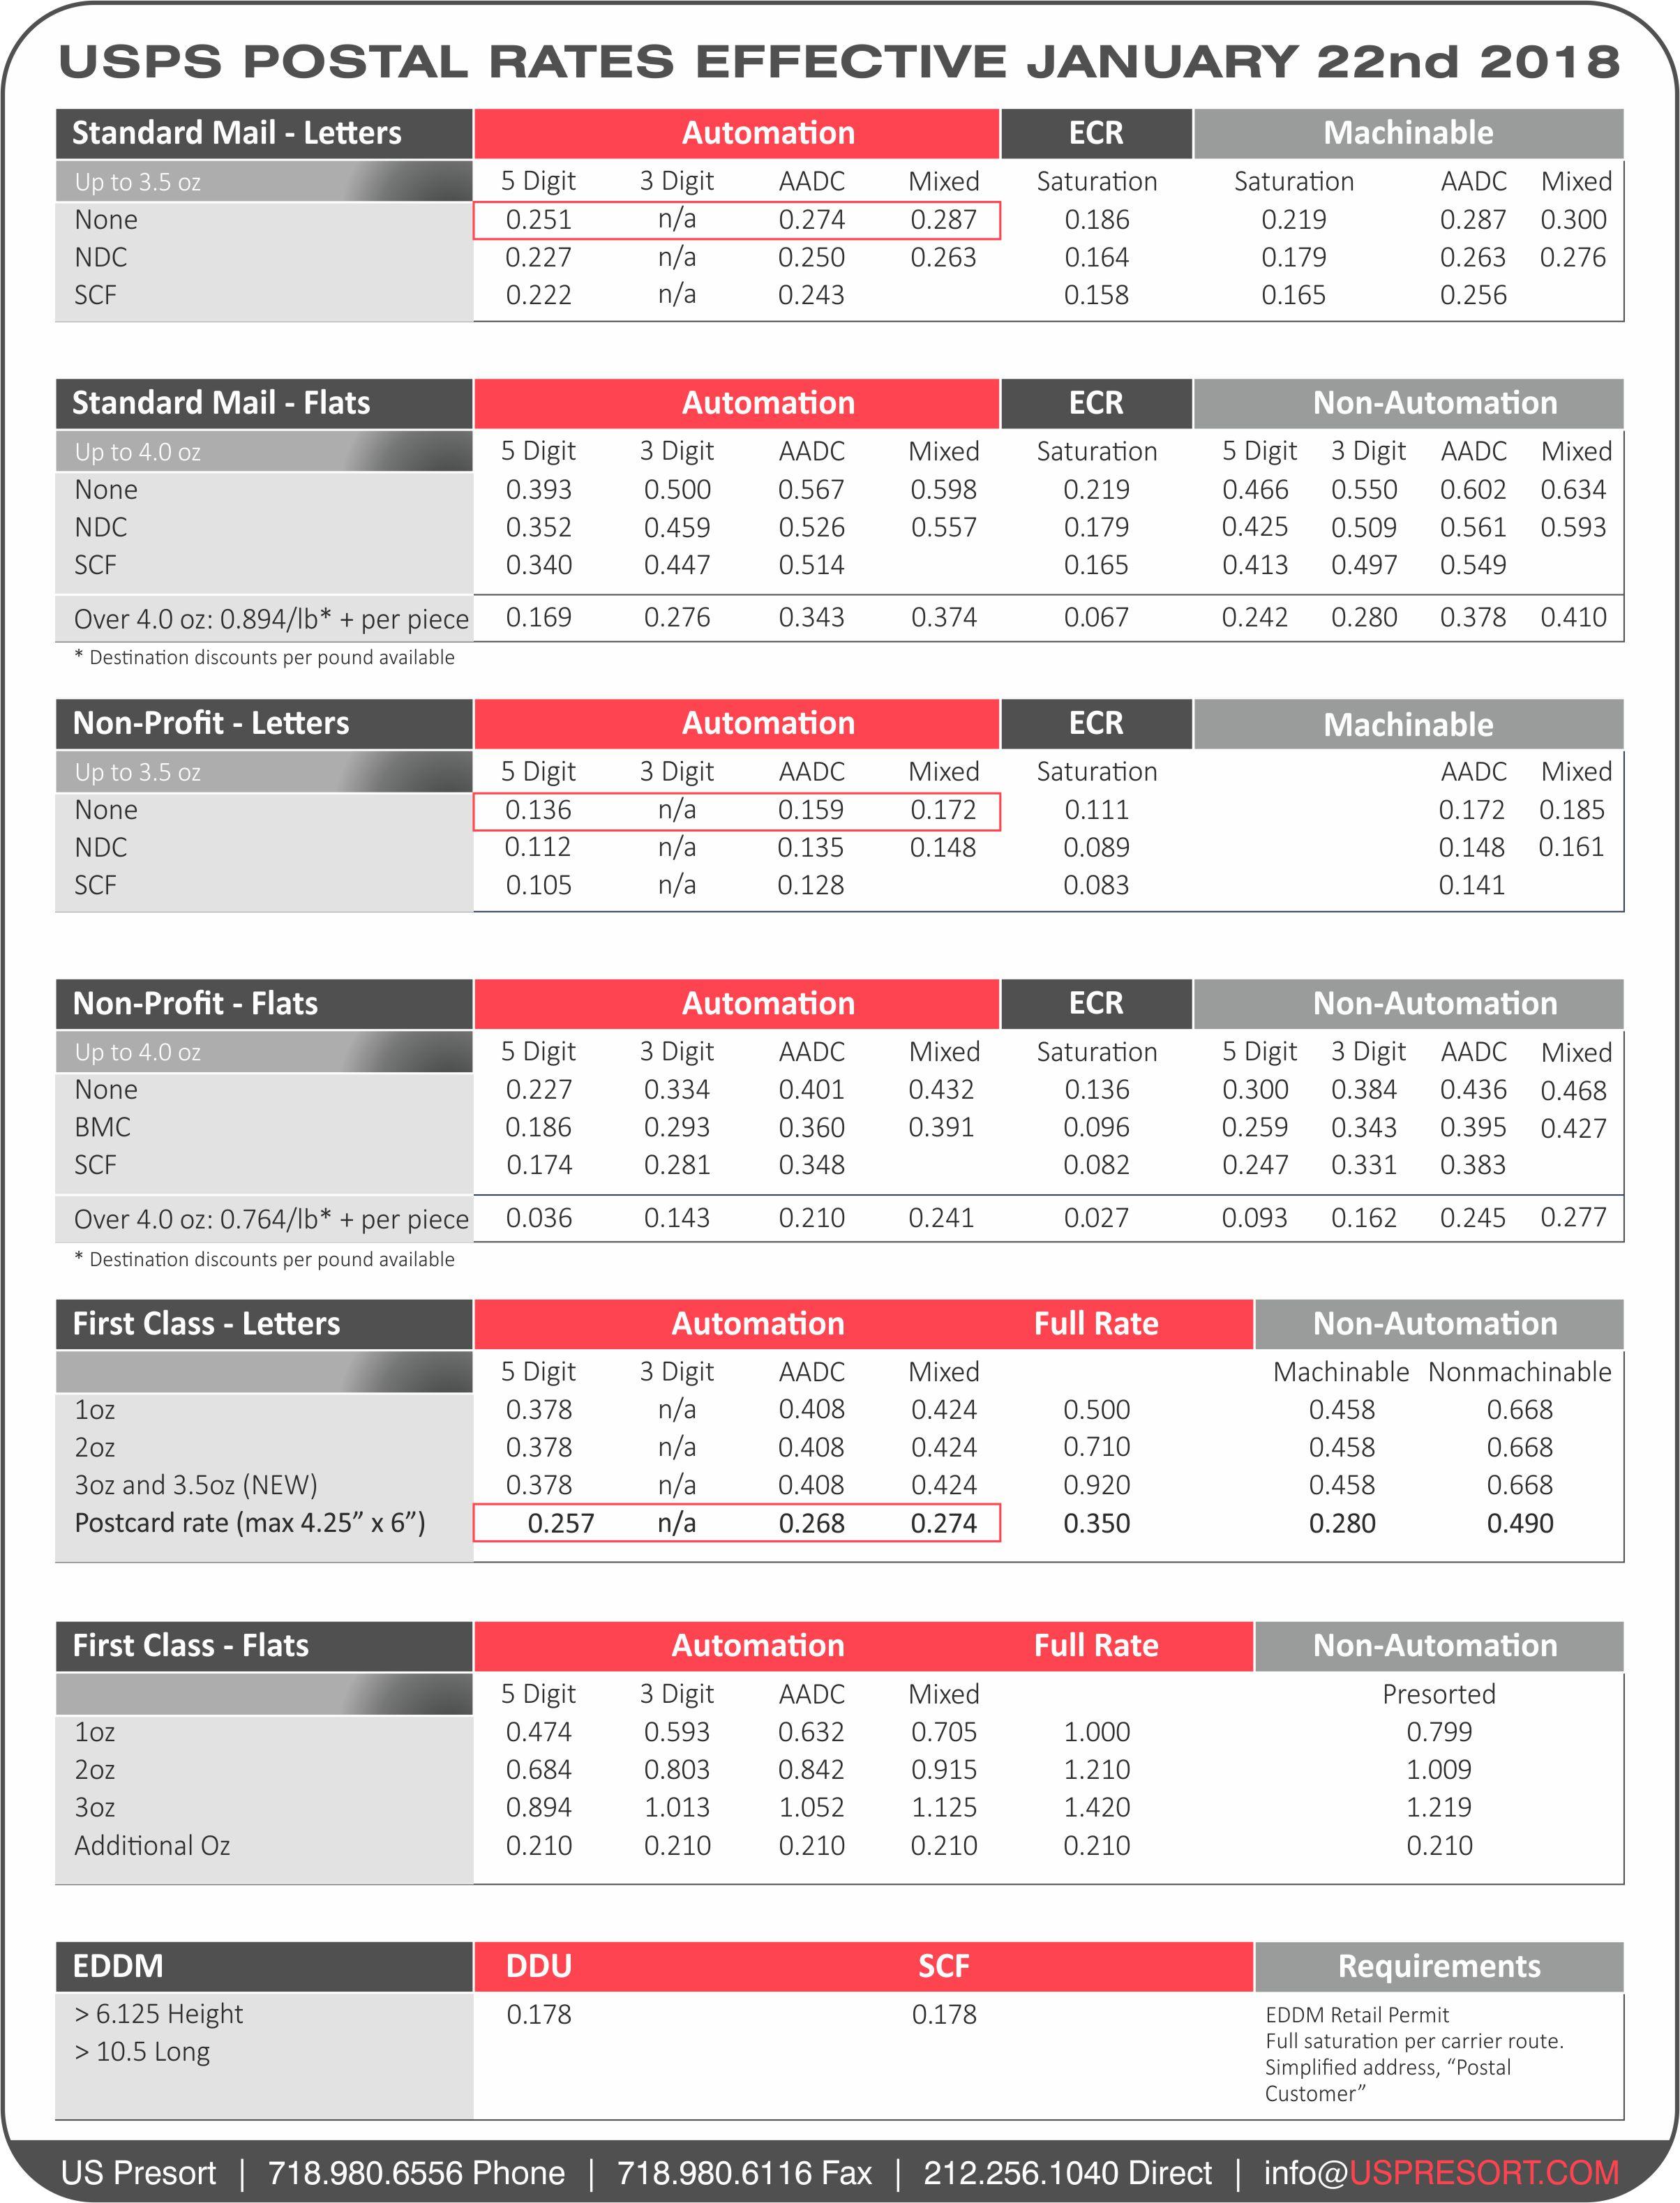 Usps Postal Rates Effective January 22nd 2018 Cheat Sheet